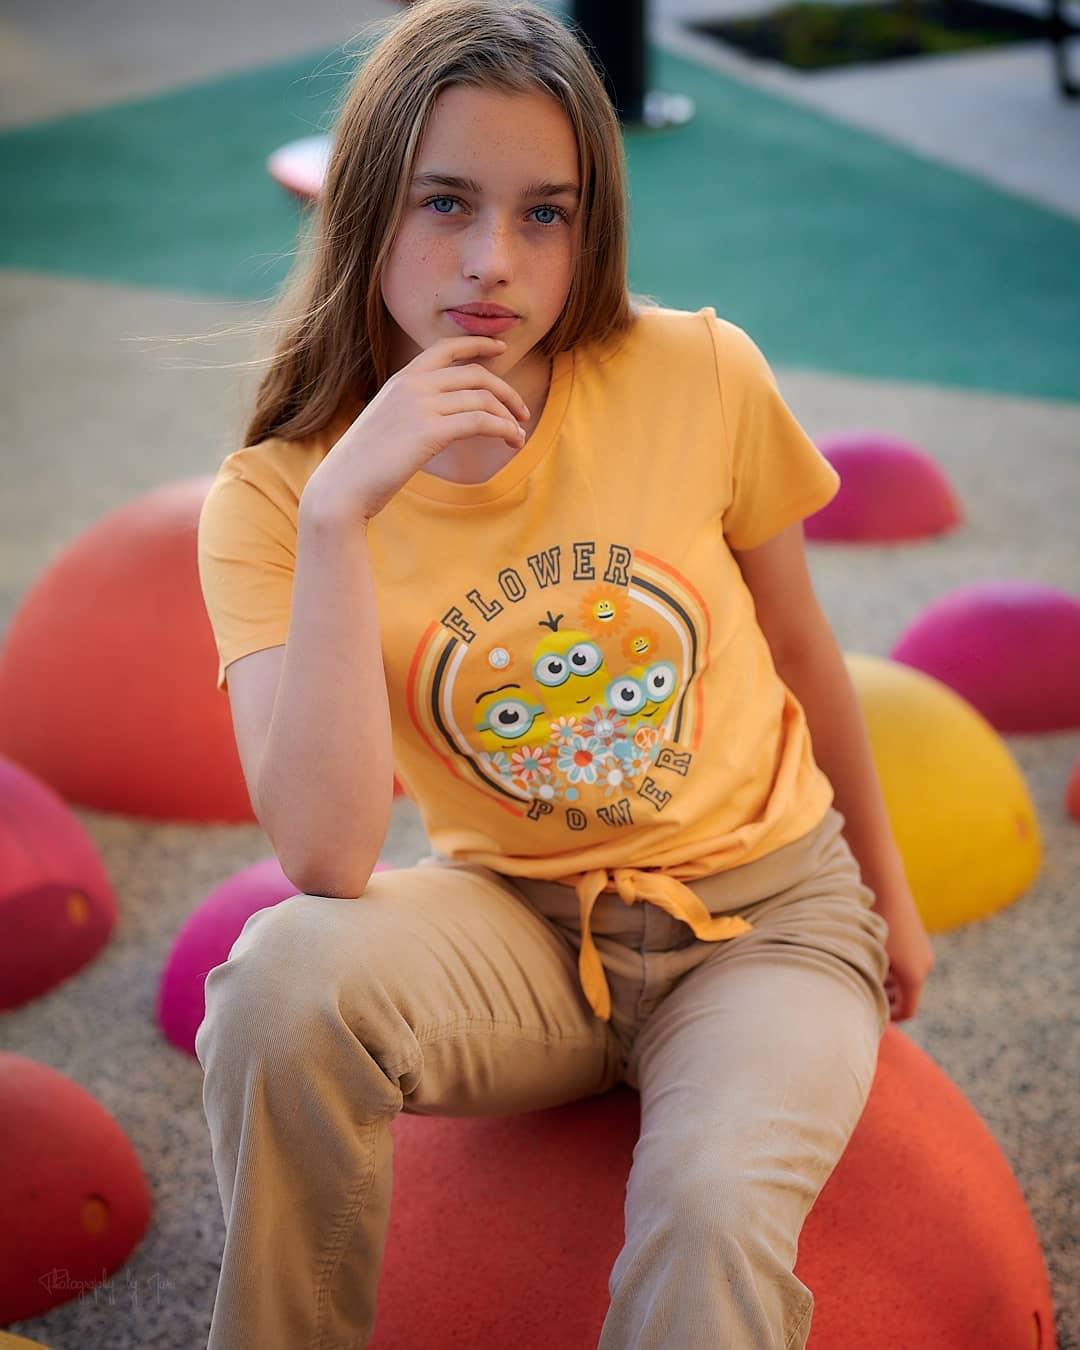 Emiliacheergirl-Wallpapers-Insta-Fit-Bio-Emilia-Danielle-Wallpapers-Insta-Fit-Bio-8